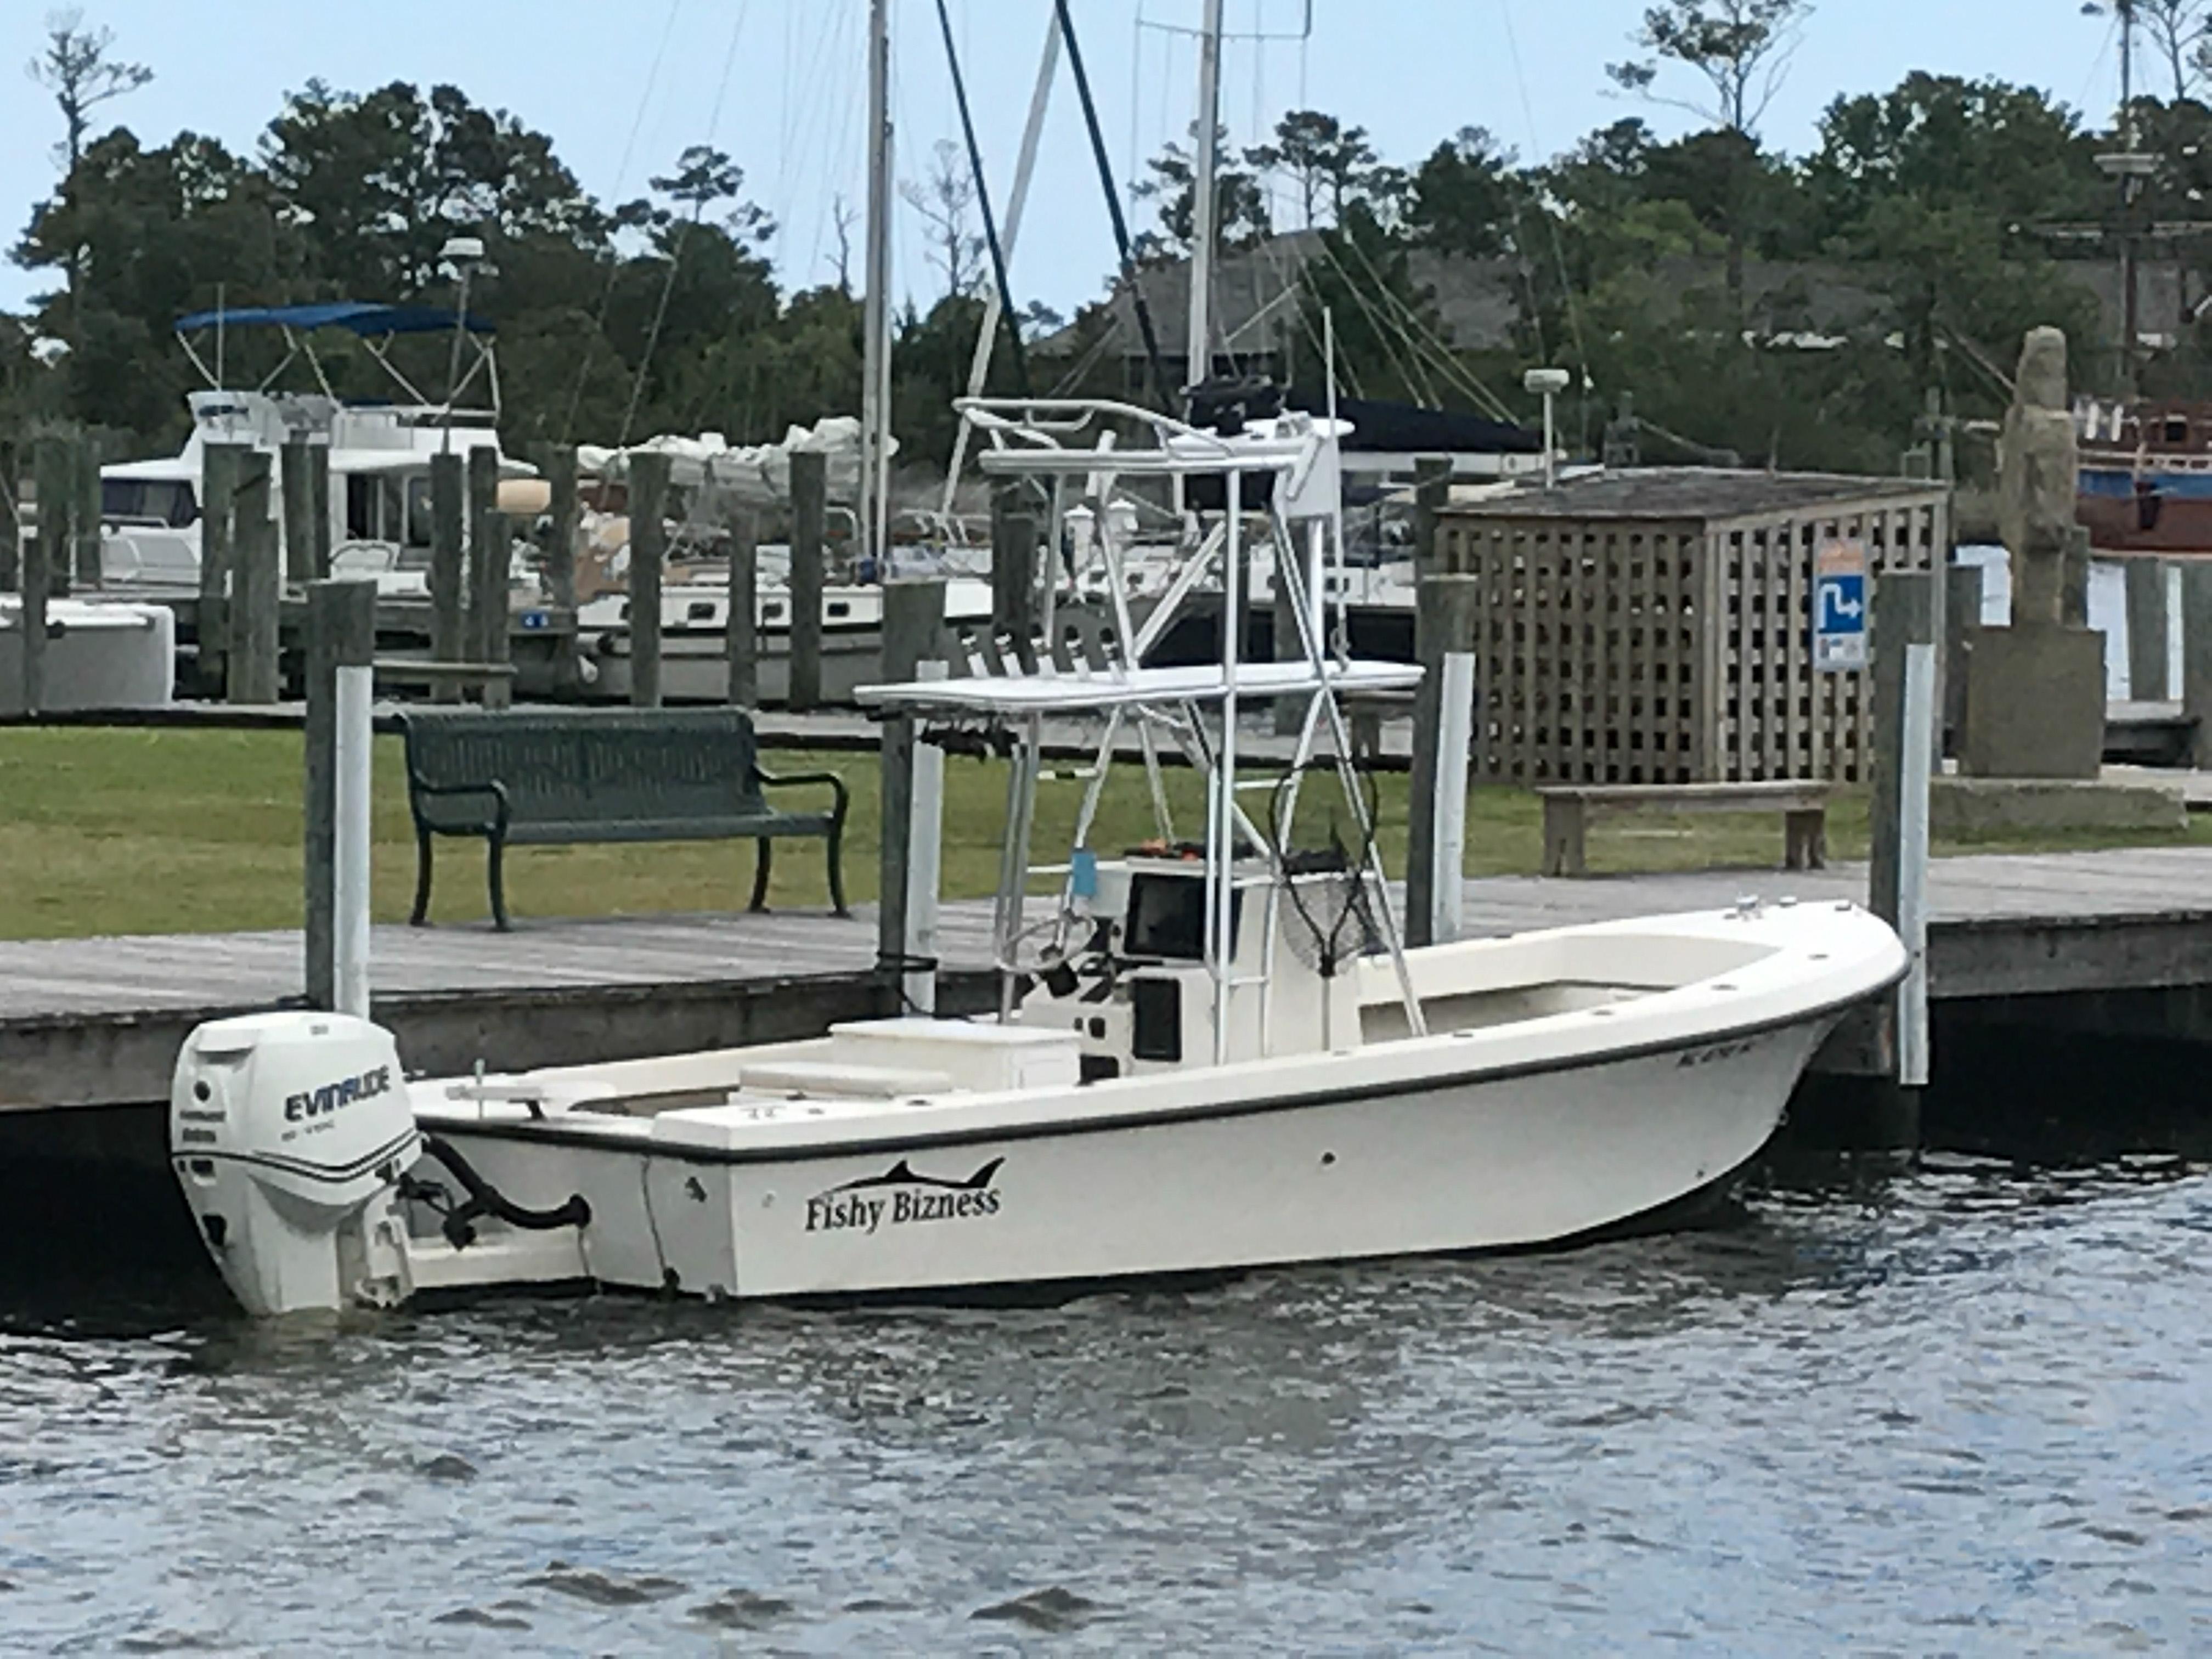 The Fishy Bizness a 23 FT Carolina Built